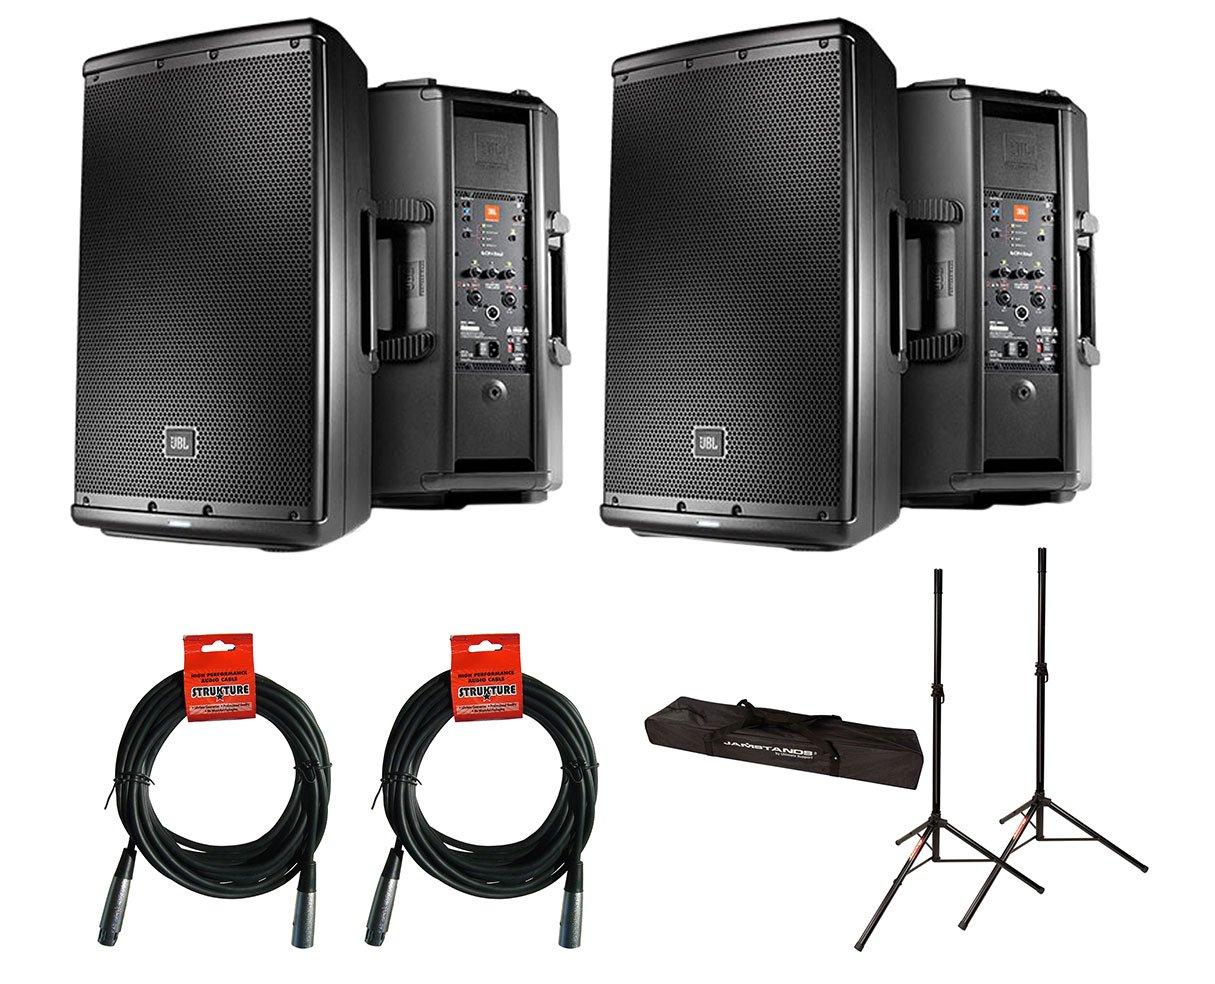 2x JBL EON612 + Stands w/ Bag + Cables